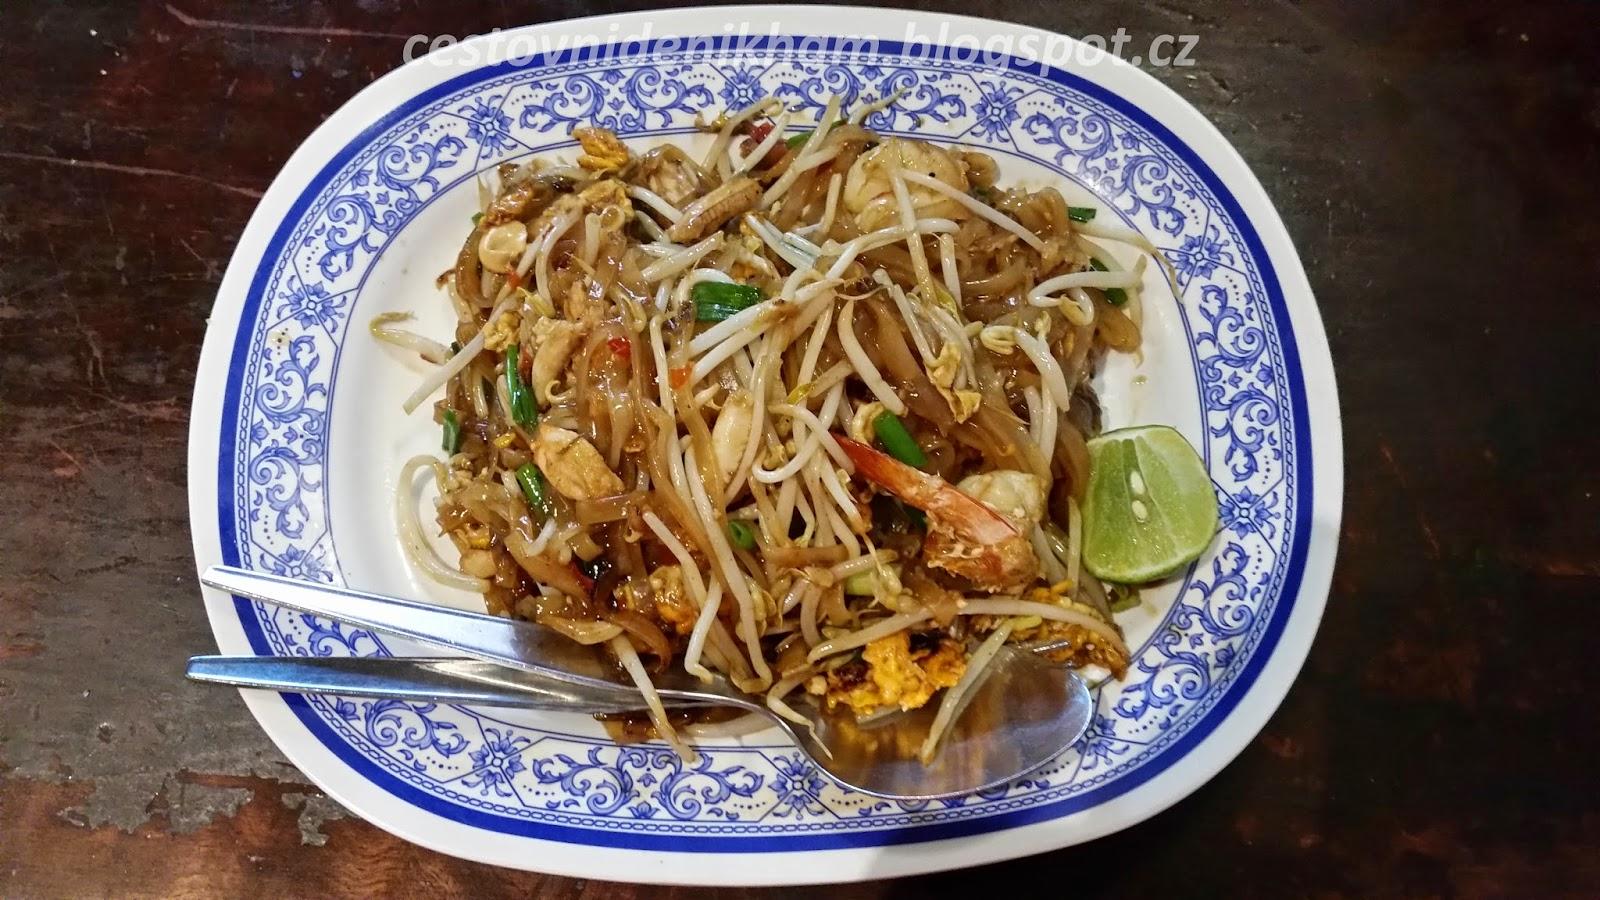 místní pokrm Pad Thai // local dish Pad Thai